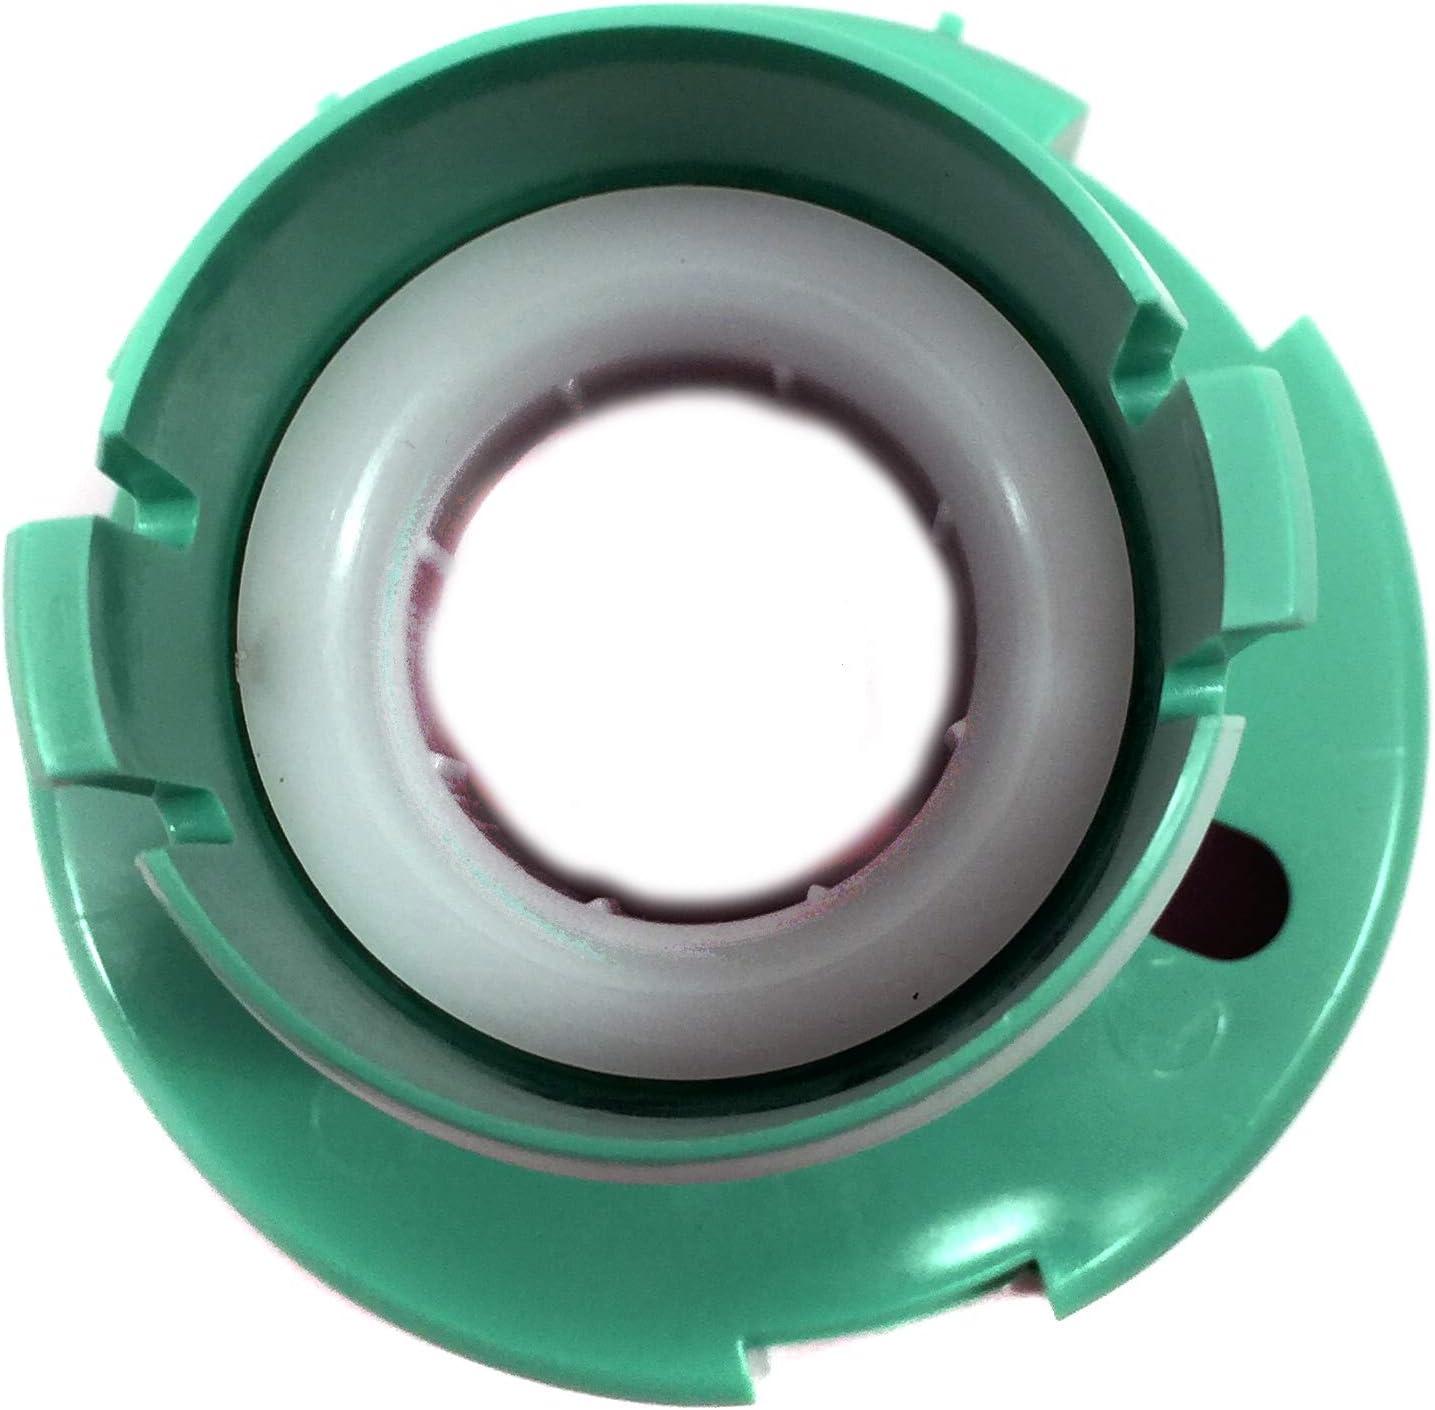 w//Bushing Lube 905-512 For: Steering Column Intermediate Shaft Lower BEARING BUSHING KIT COMPLETE KIT